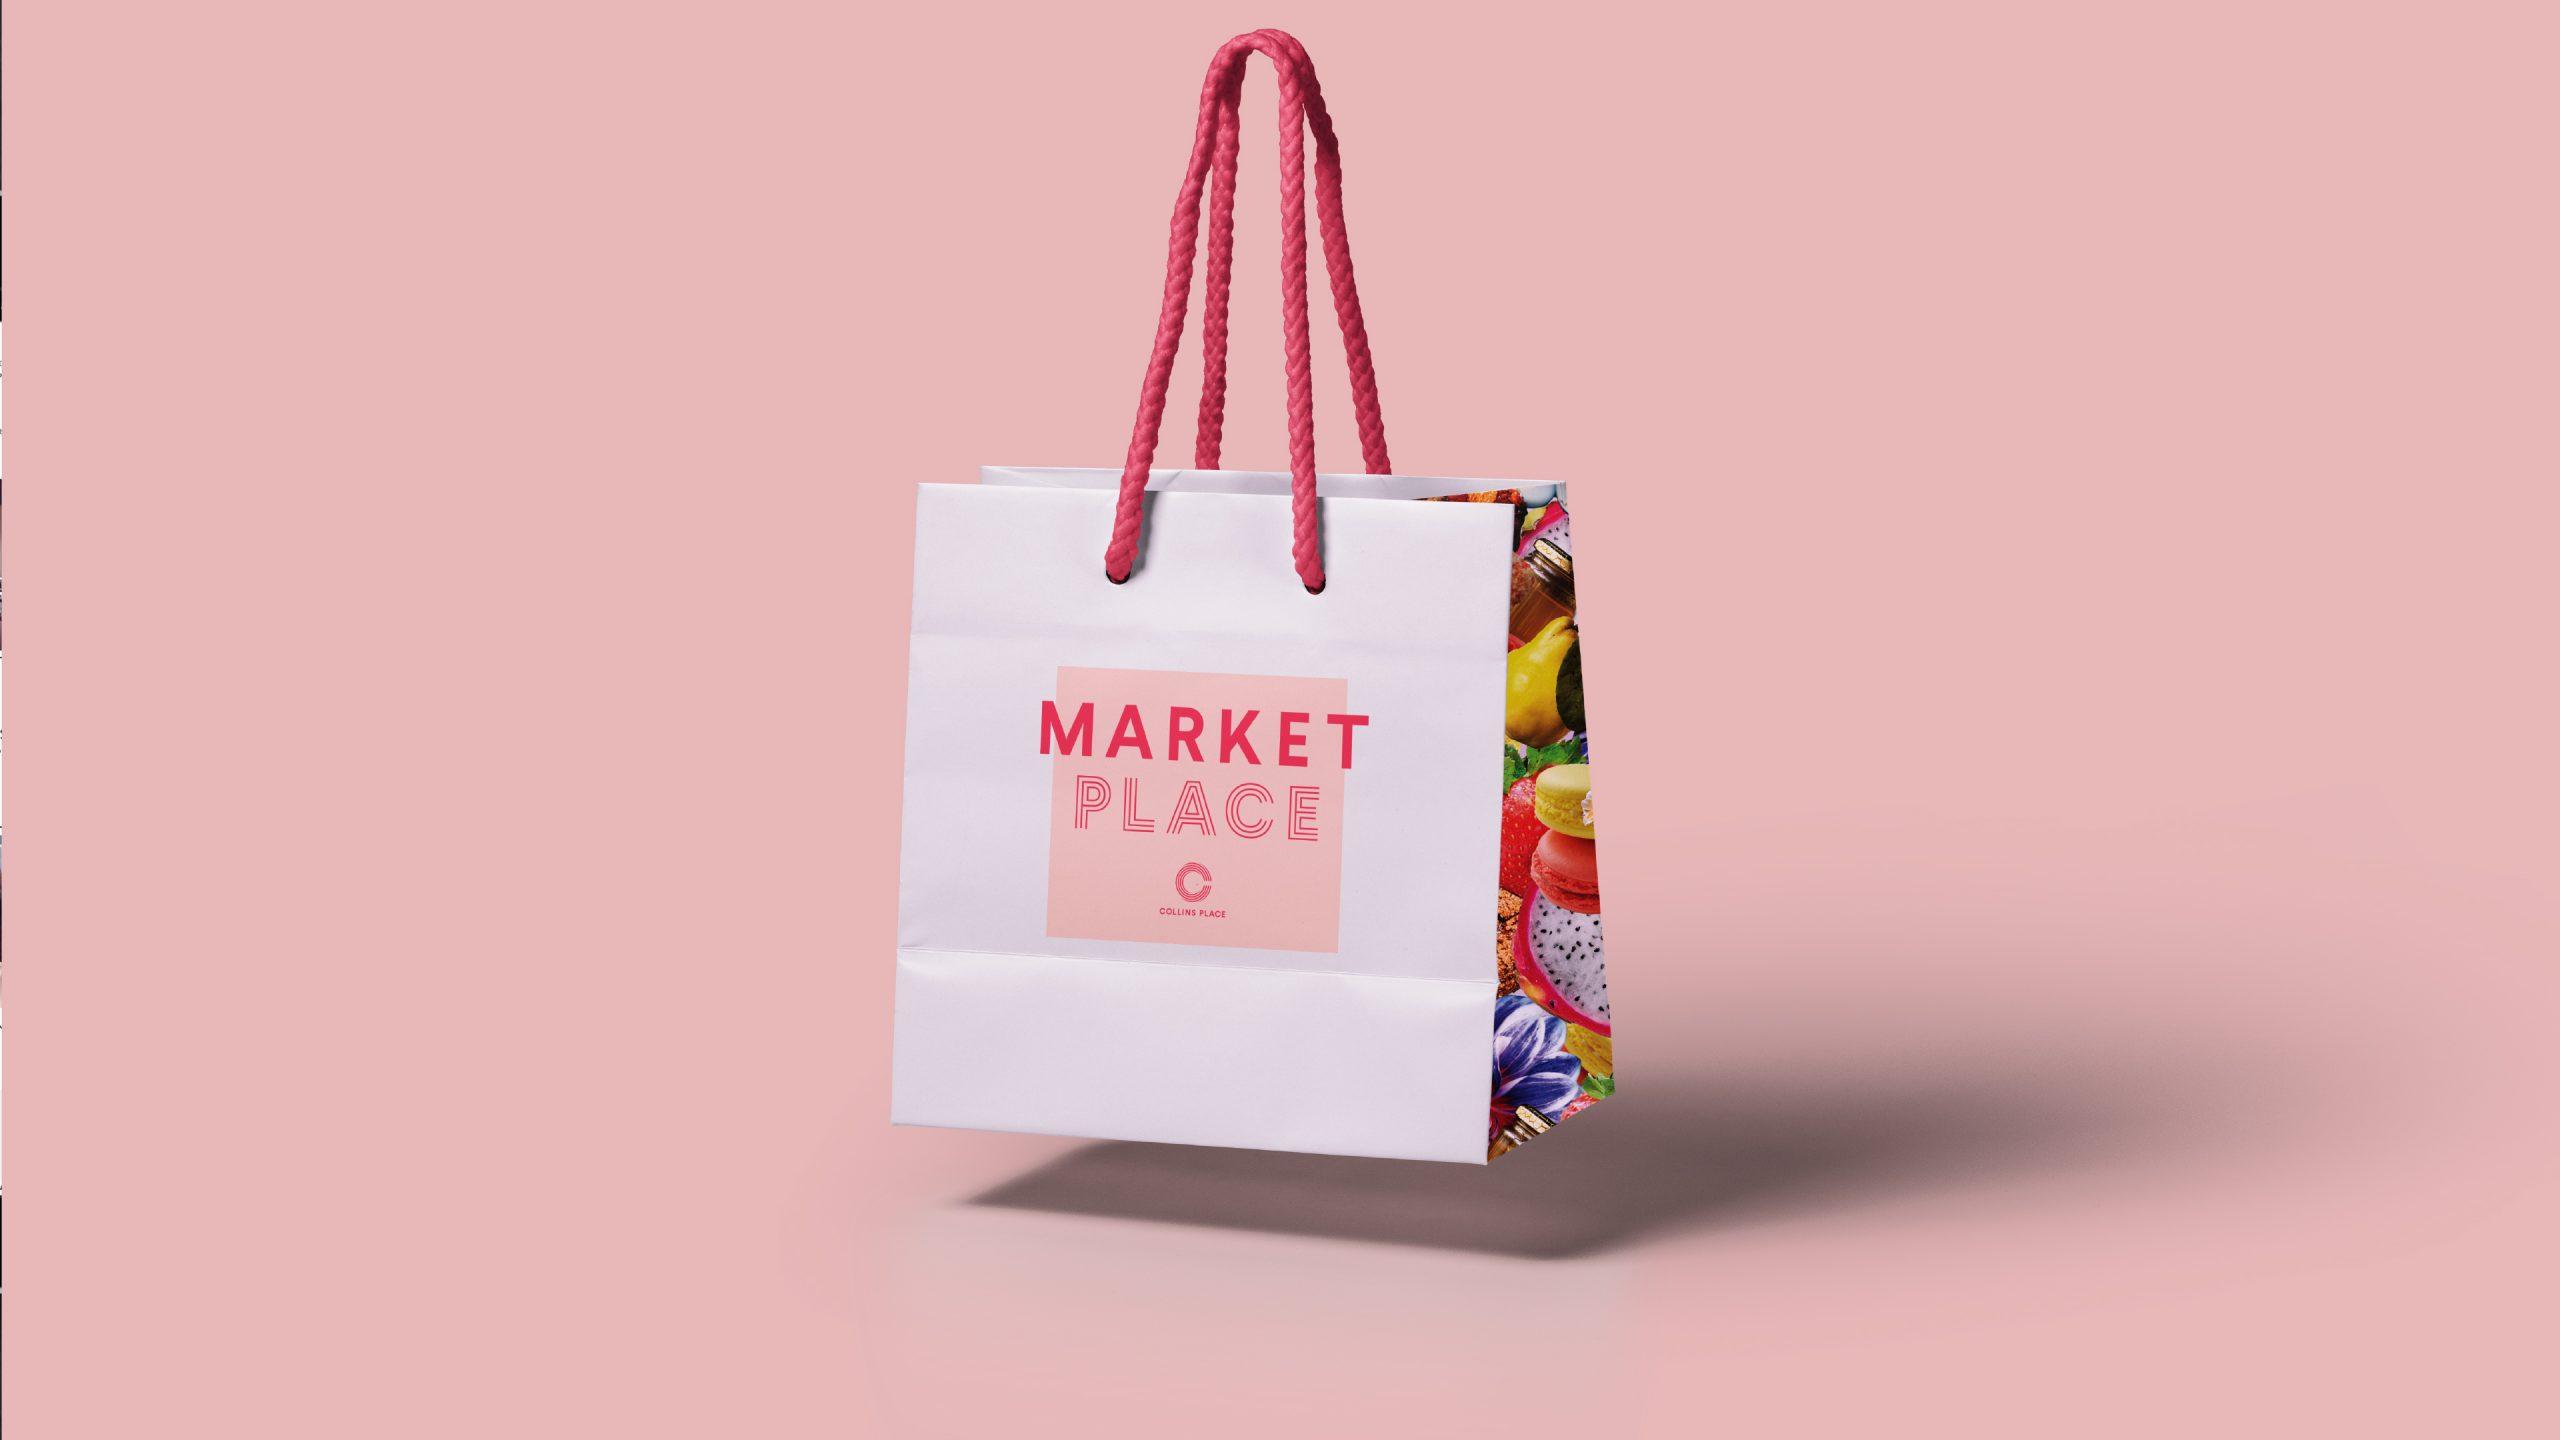 Collins Place Market Place tote bag designed by Helium Design Melbourne.